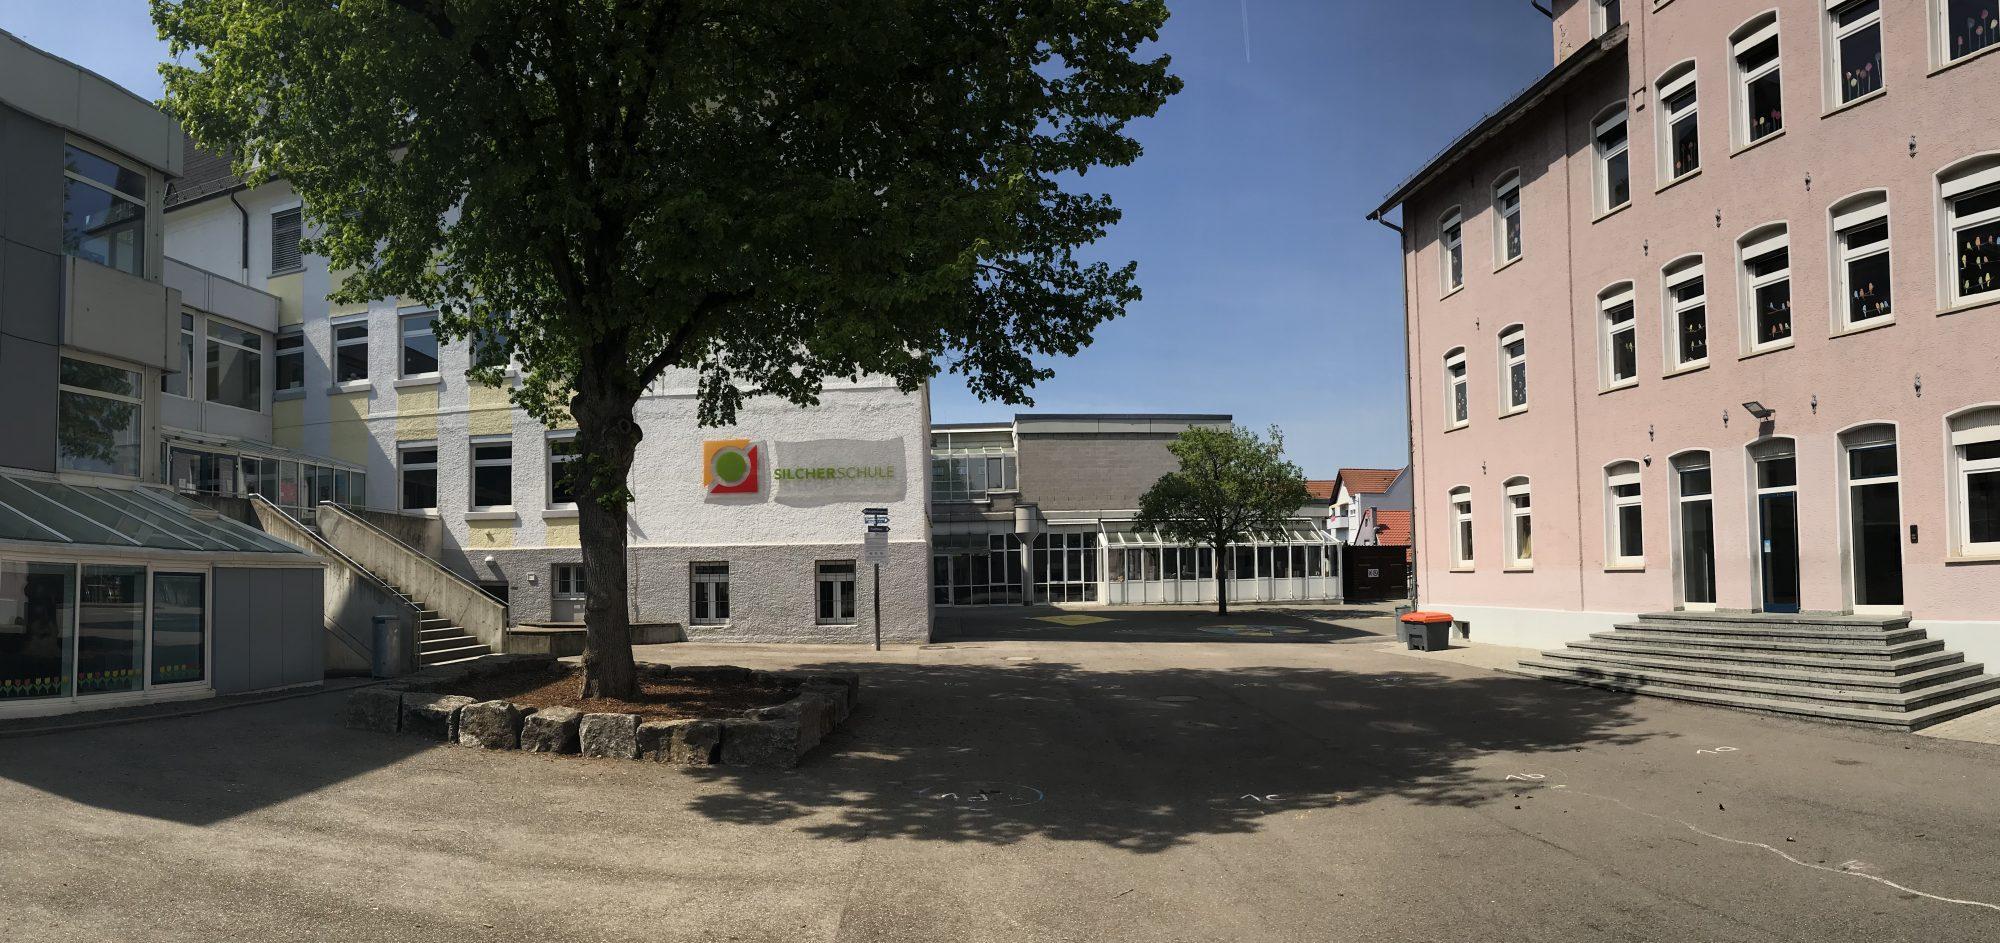 Silcherschule Eislingen